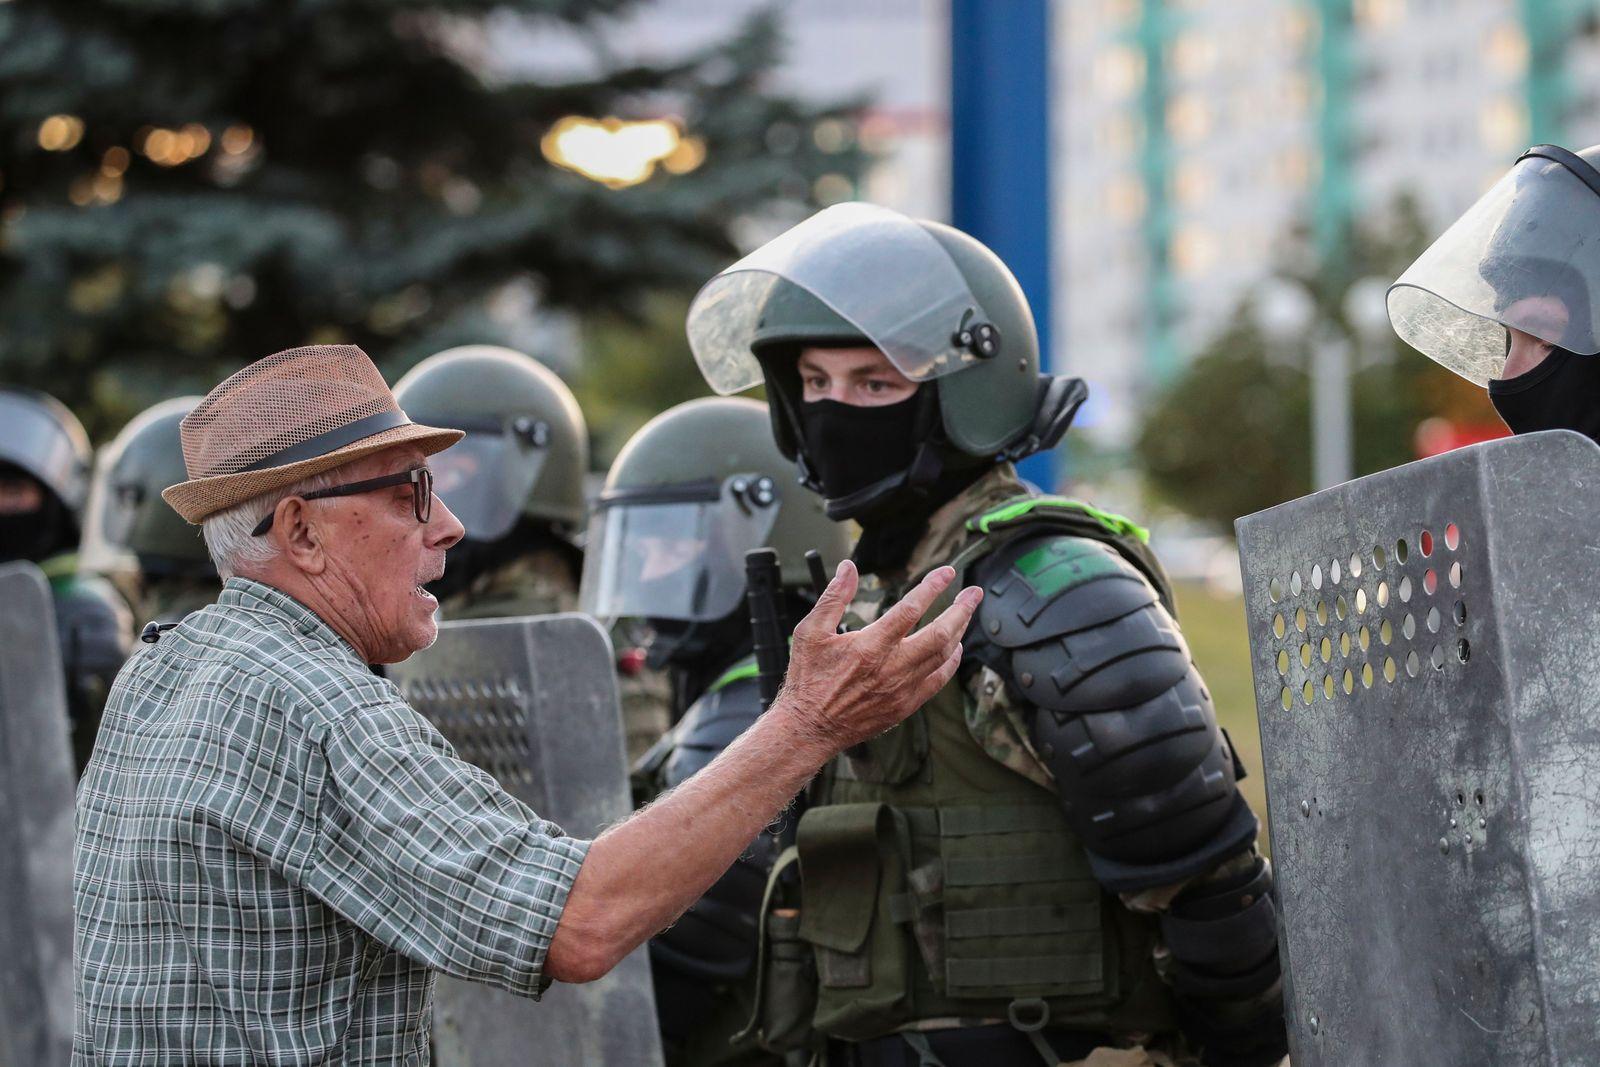 Presidential elections reactions in Belarus, Minsk - 11 Aug 2020